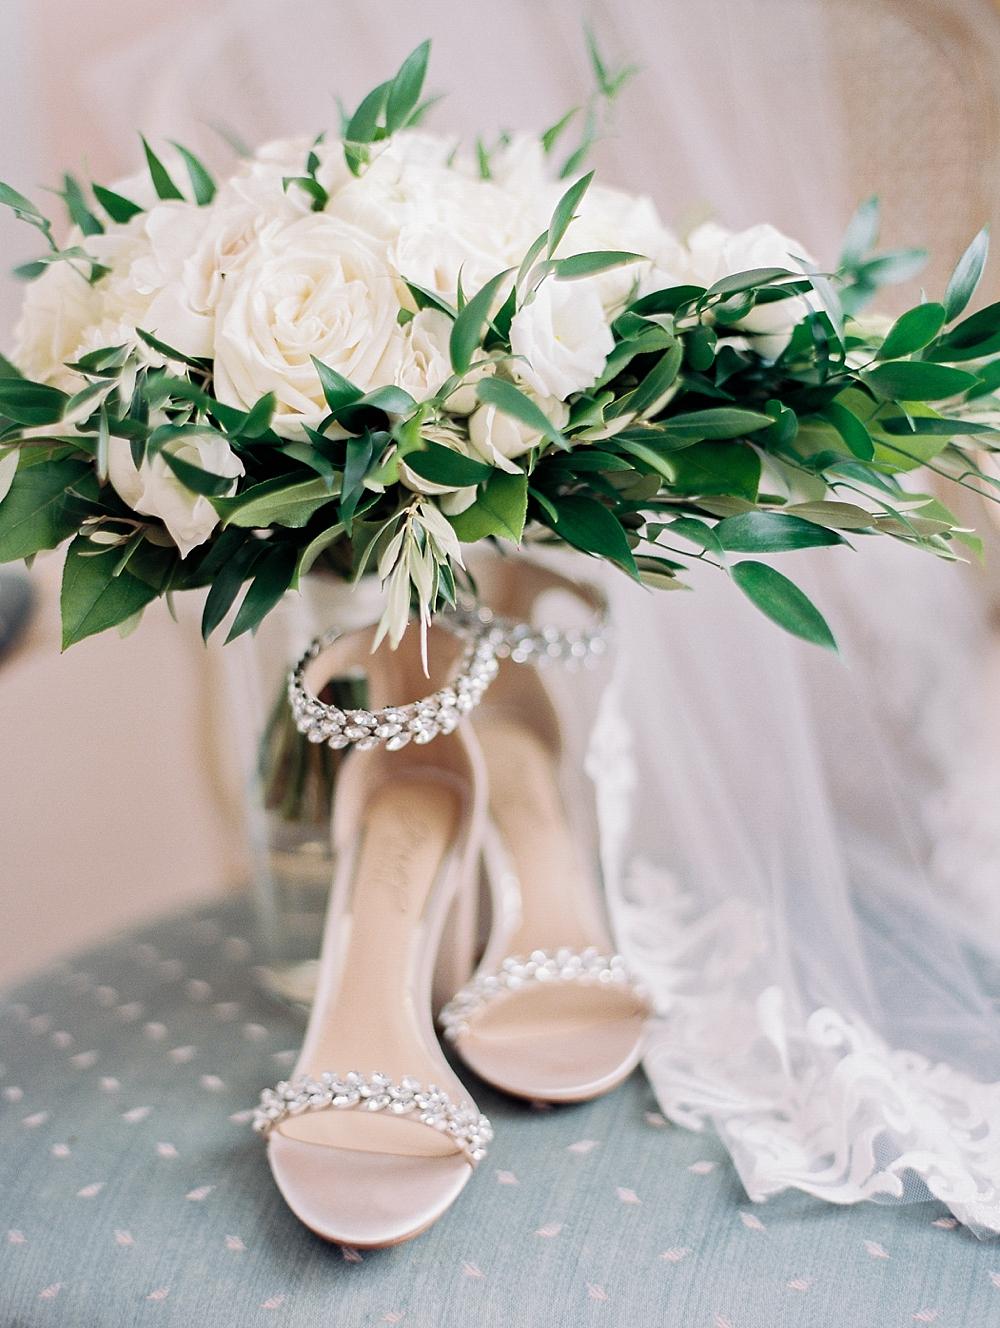 kristin-la-voie-photography-lehmann-mansion-wedding-photographer-117